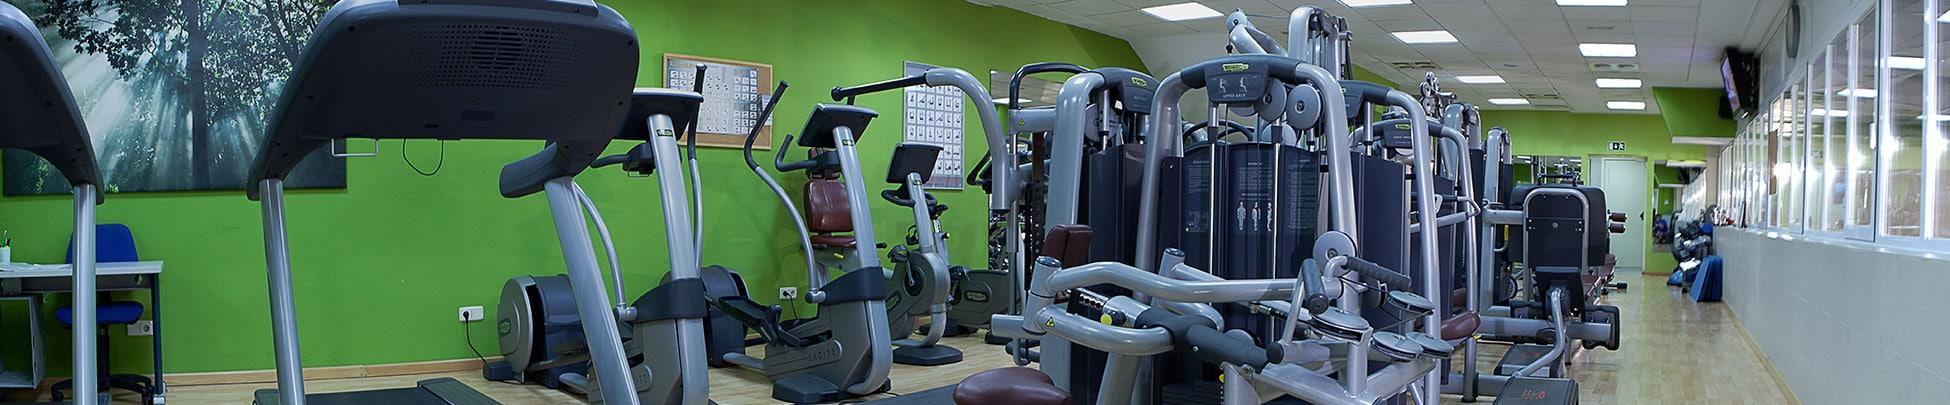 sala-fitness-centro-deportivo-el-pilar